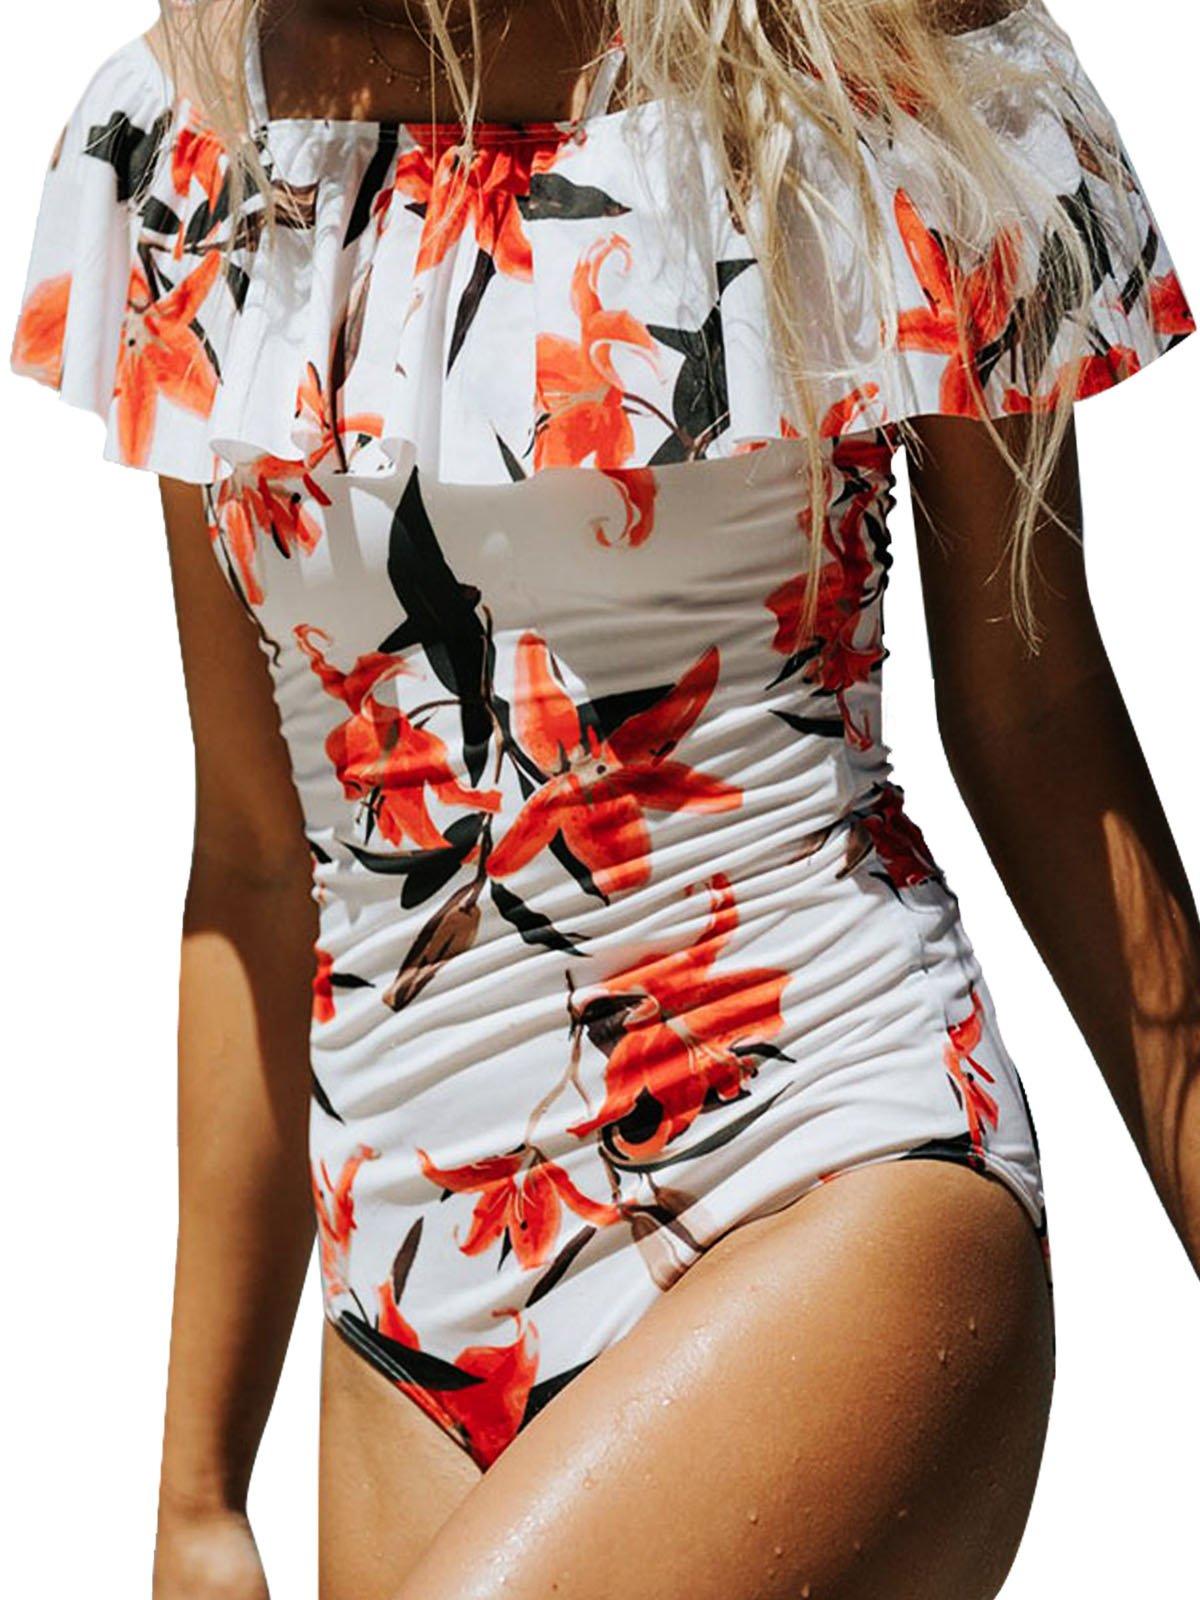 Bong Buy Fashion Womens One Pioece Flounce Monokini Padded Colorblock Off Shoulder Floral Bikini Swimsuit(white,M)